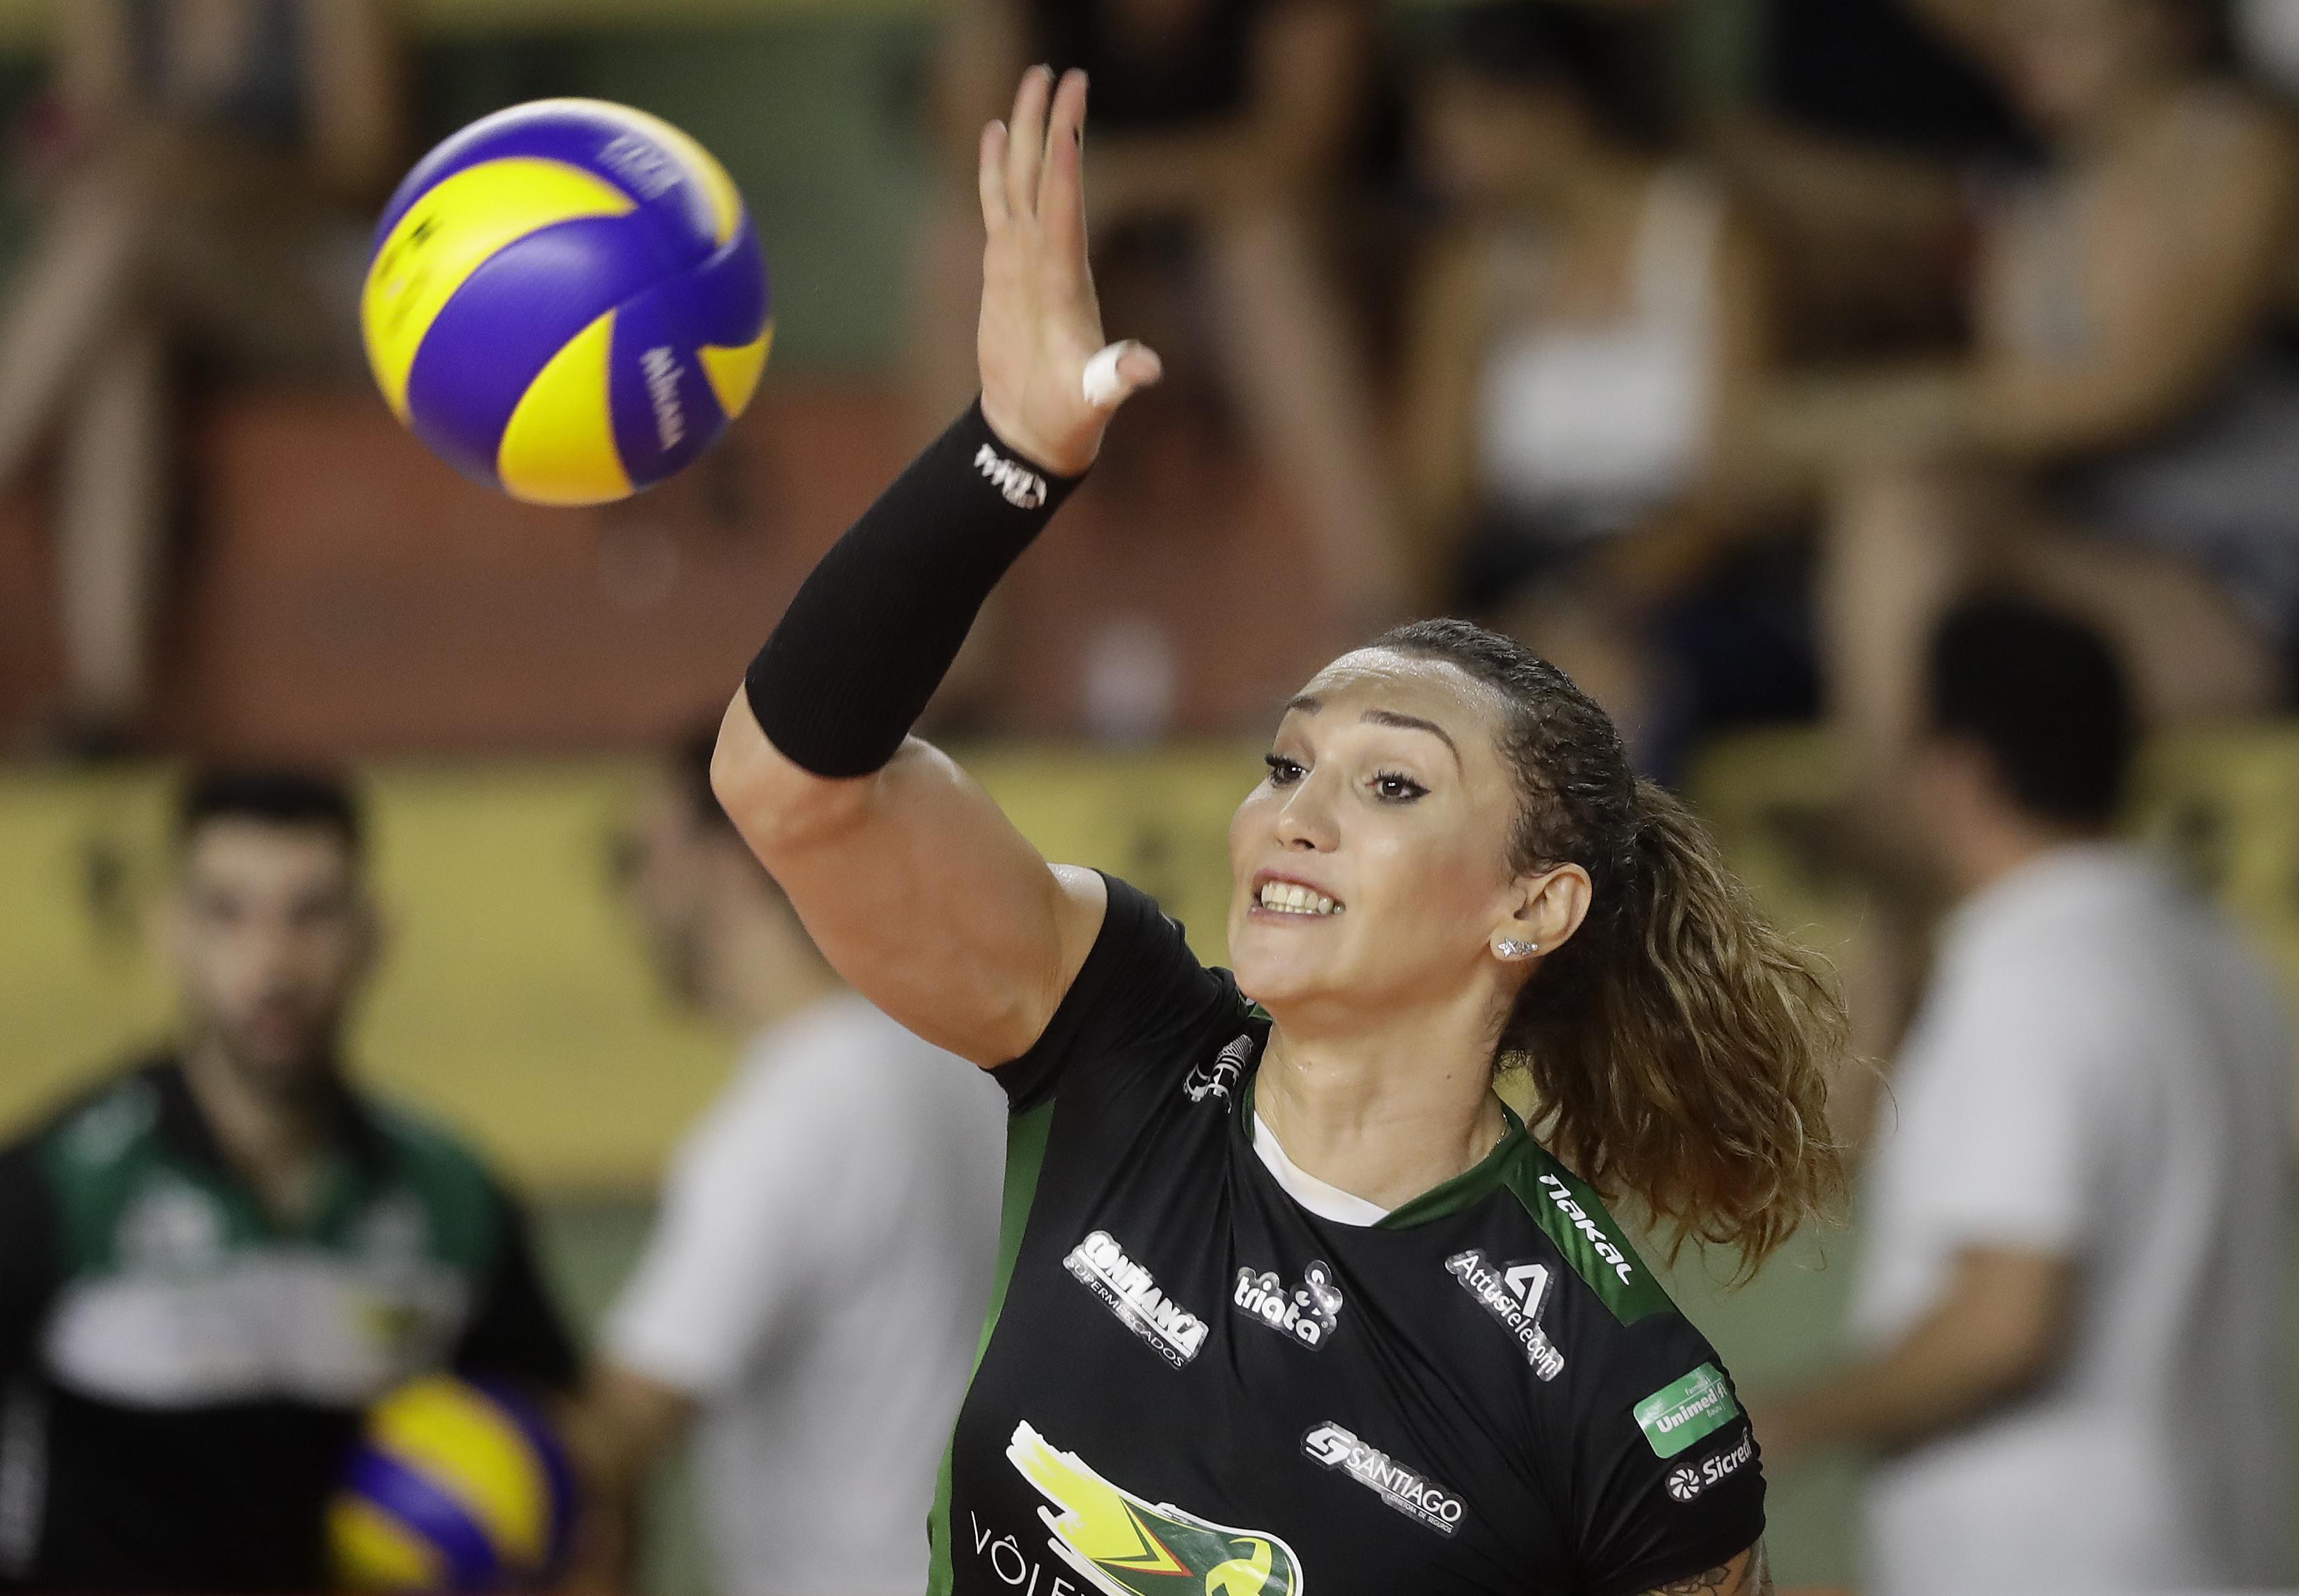 Tiffany Abreu spikes the ball during a Brazilian volleyball league match in Bauru, Brazil, Tuesday, Dec. 19, 2017.